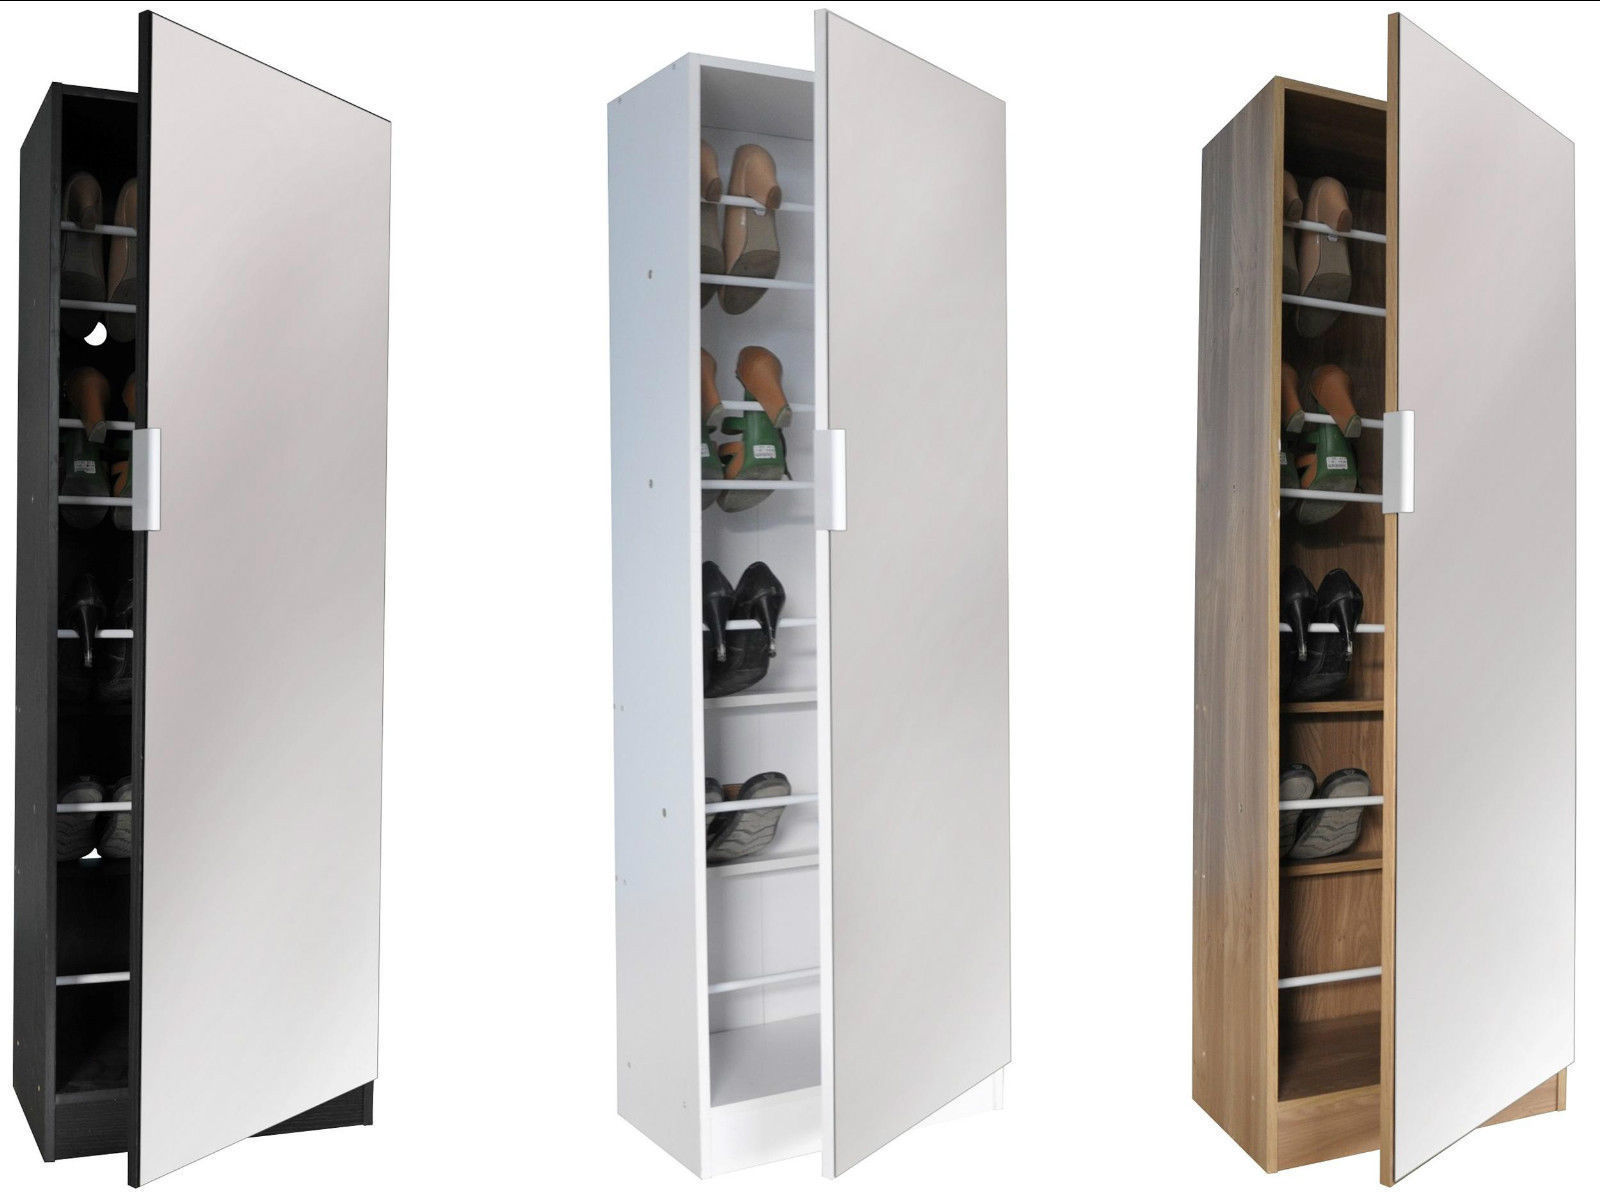 Prime Details About 5Ft Mirrored Shoe Cabinet Storage 150Cm 5 Tier Full Mirror Black White Oak Download Free Architecture Designs Grimeyleaguecom